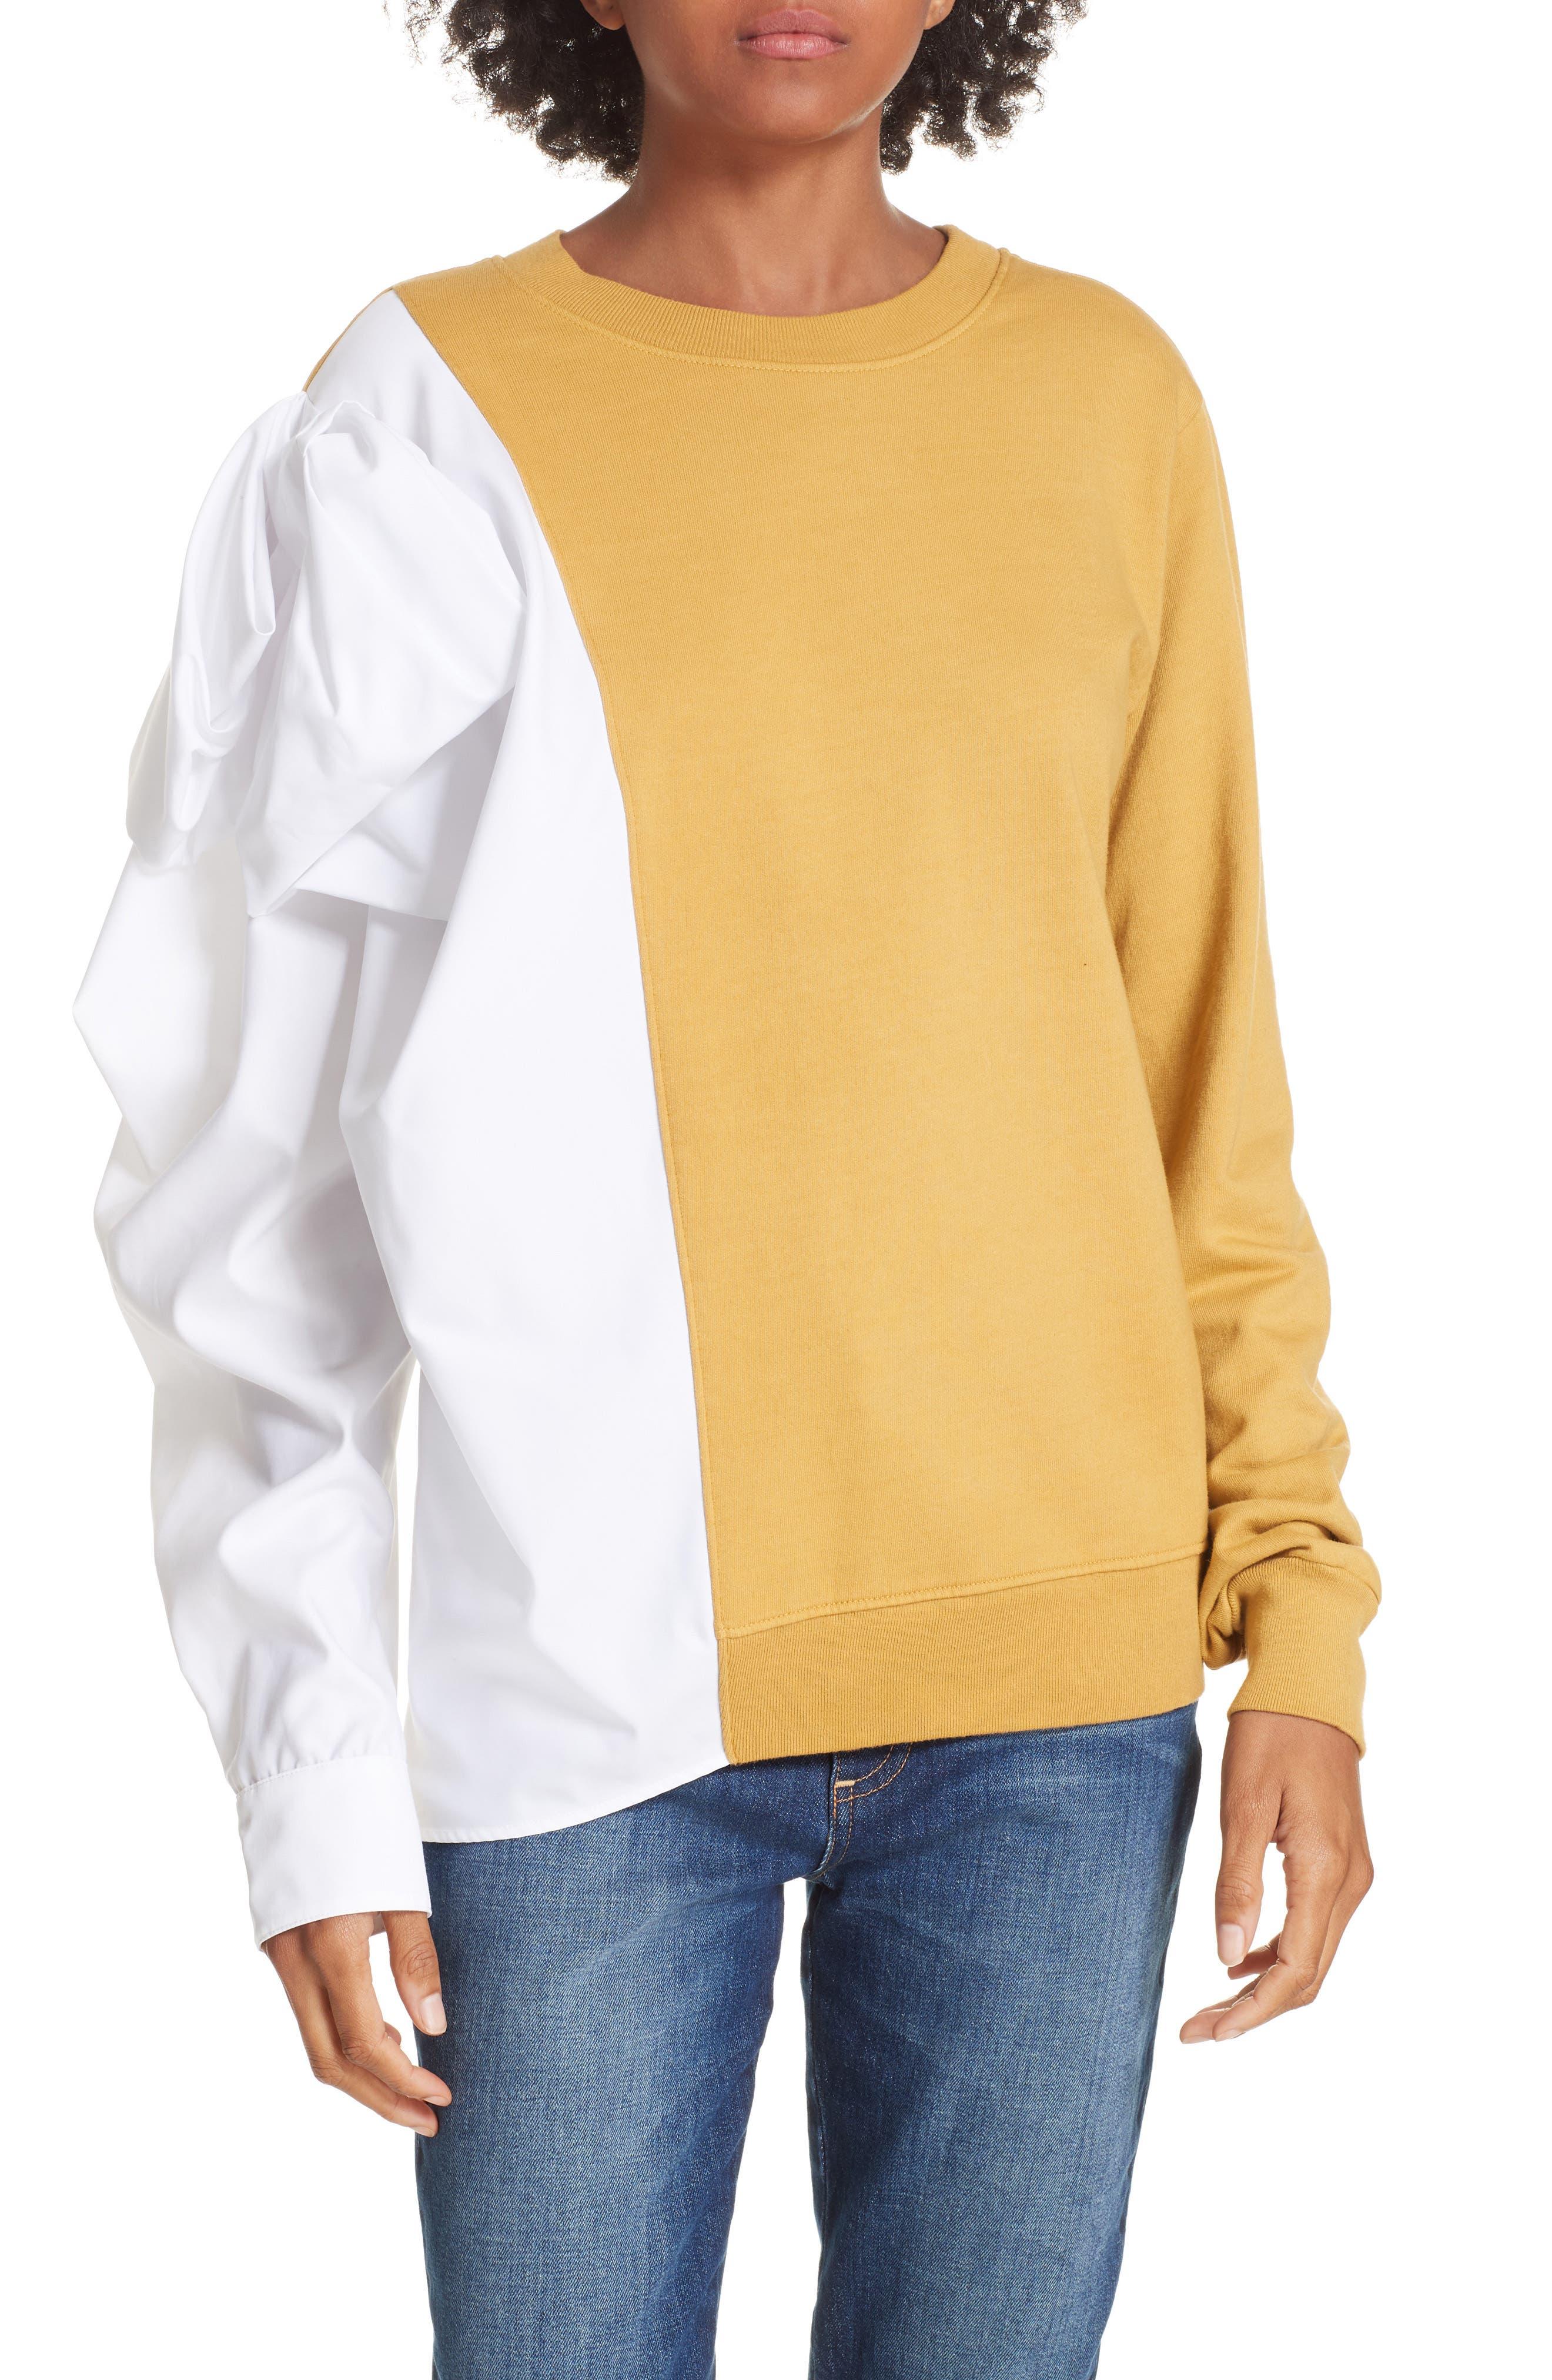 Bow Colorblock Sweatshirt,                             Main thumbnail 1, color,                             MUSTARD/ WHITE